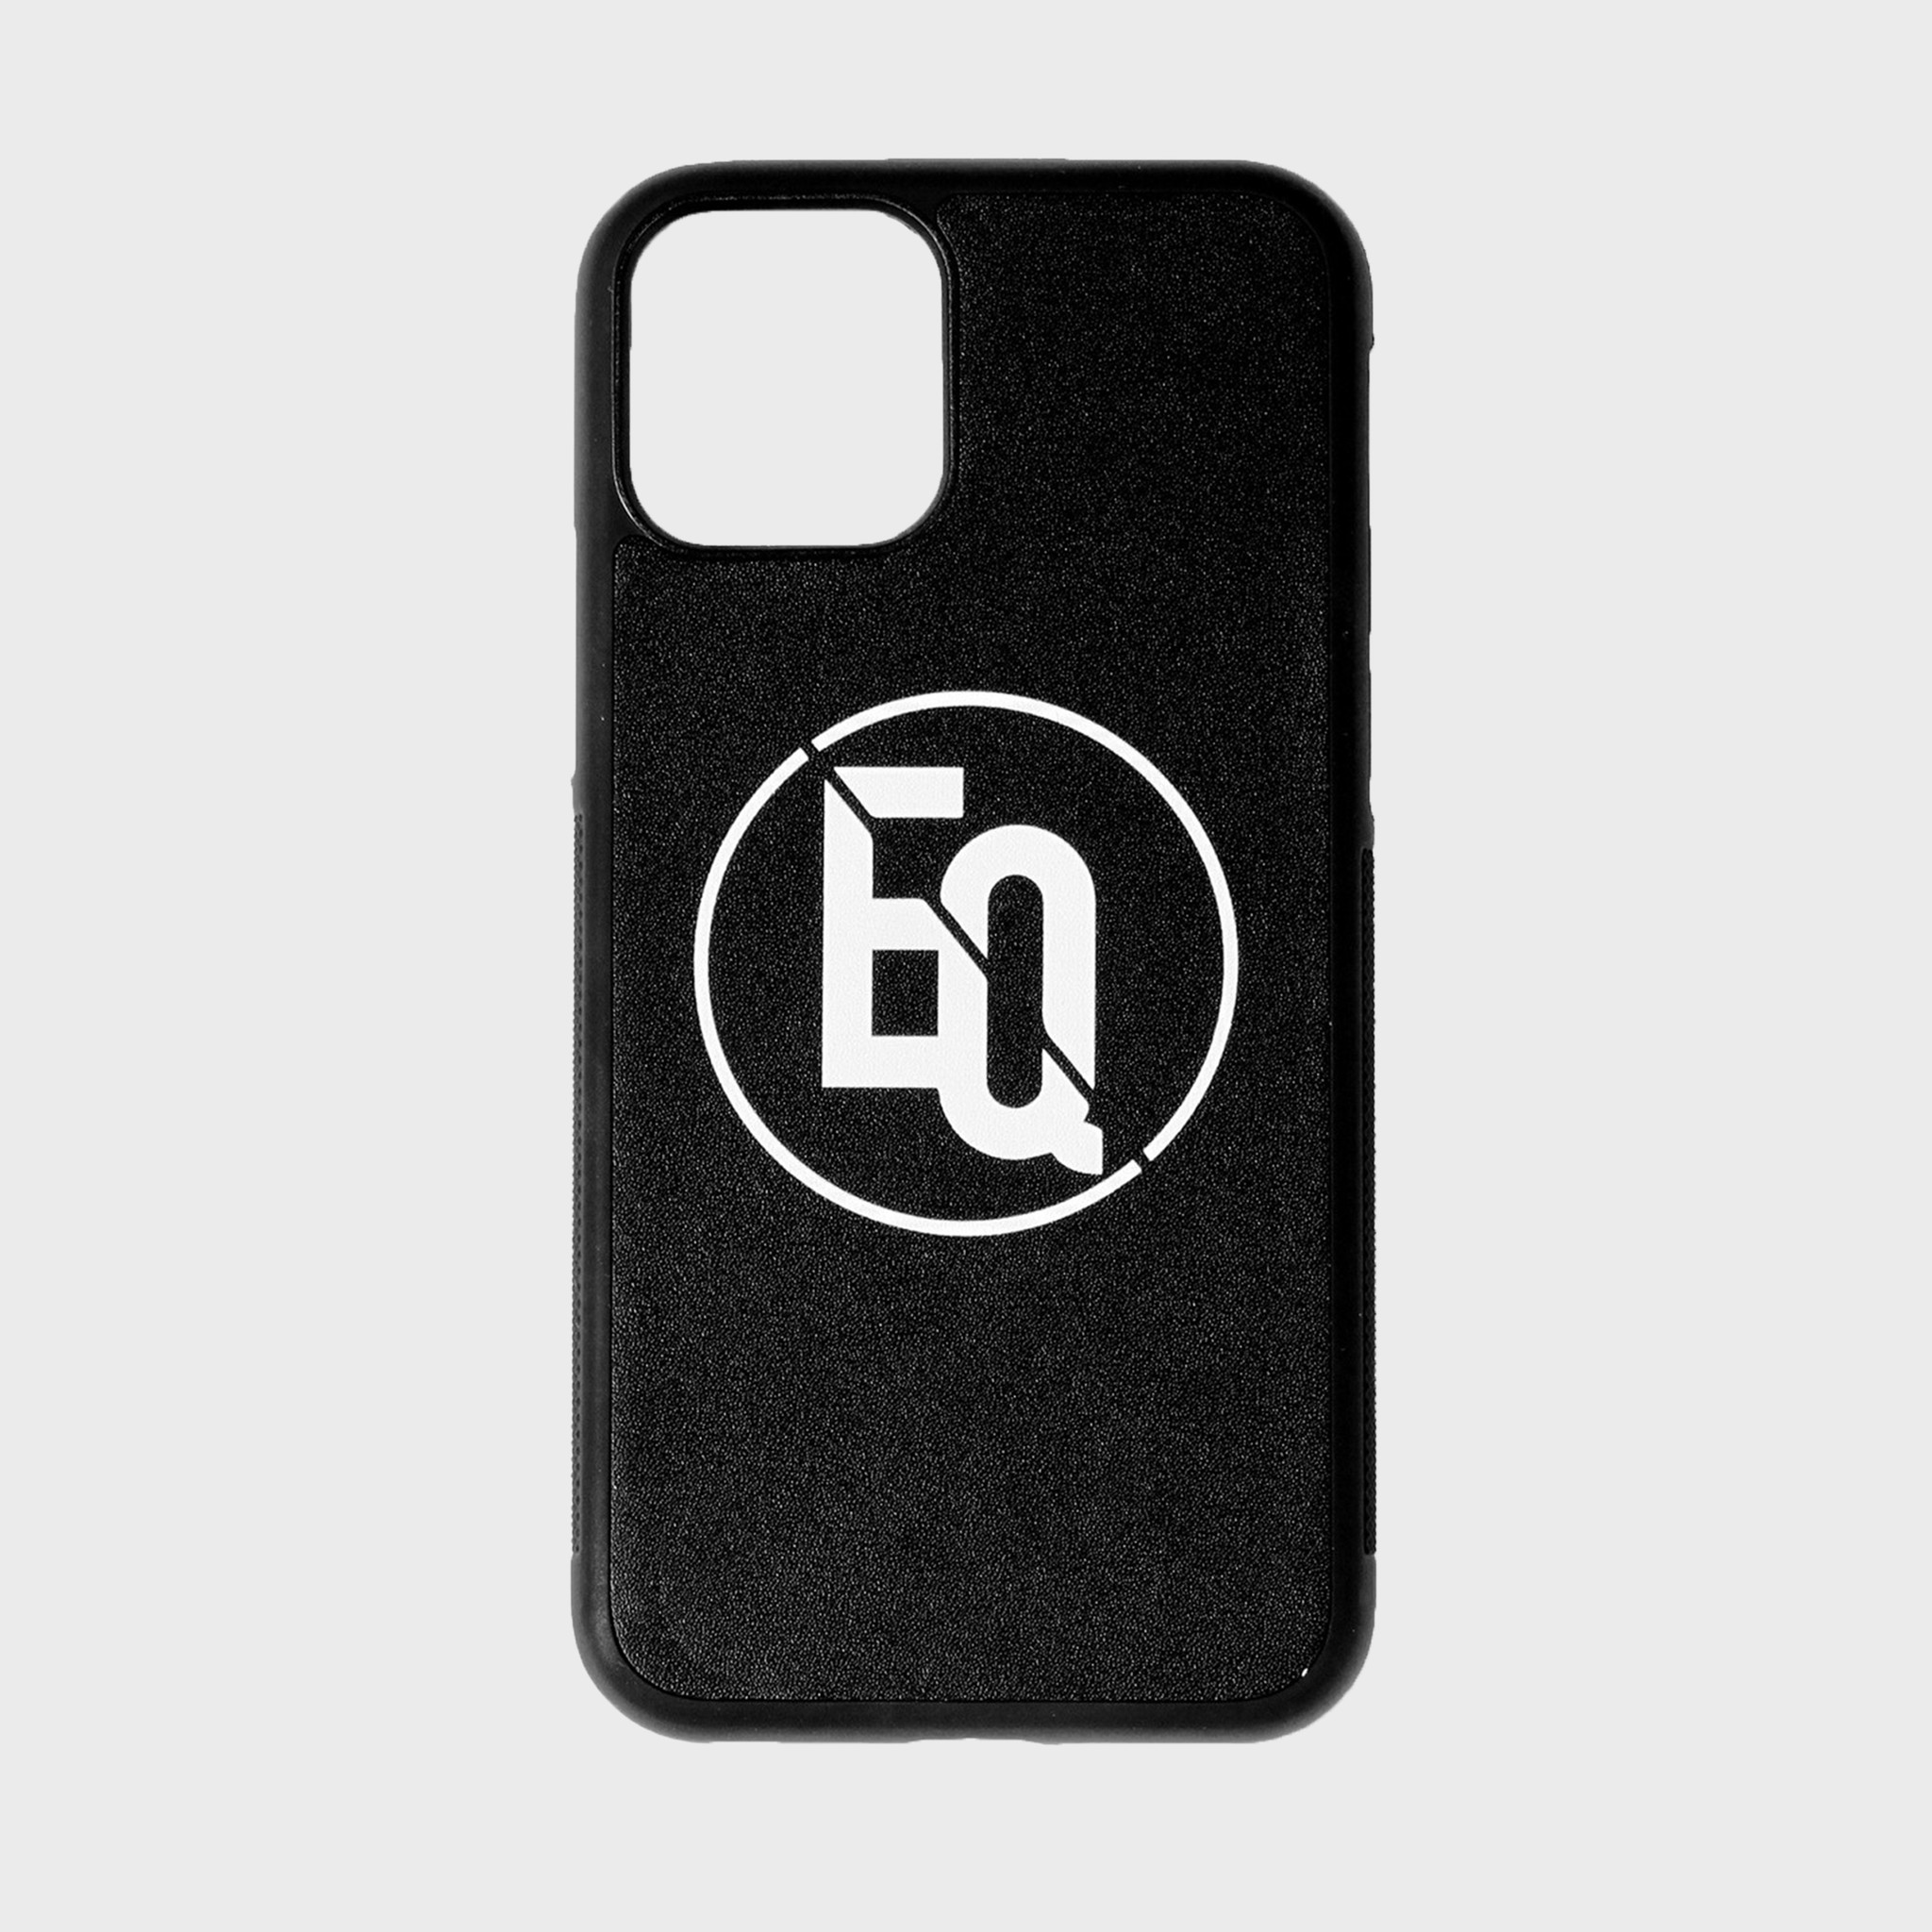 EQ IPHONE CASE BLACK-1